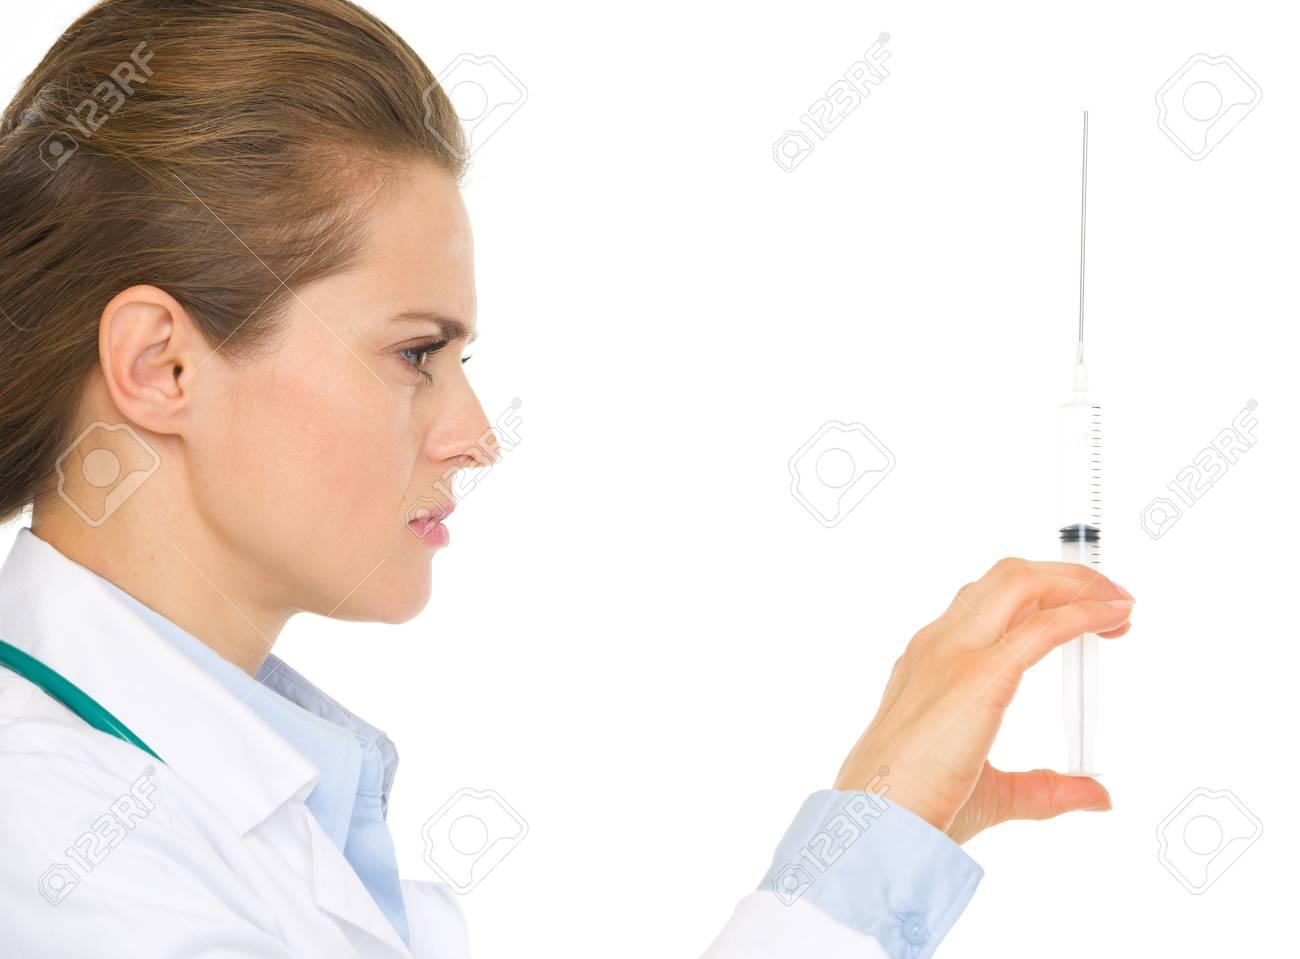 Closeup on medical doctor woman holding syringe Stock Photo - 17056173